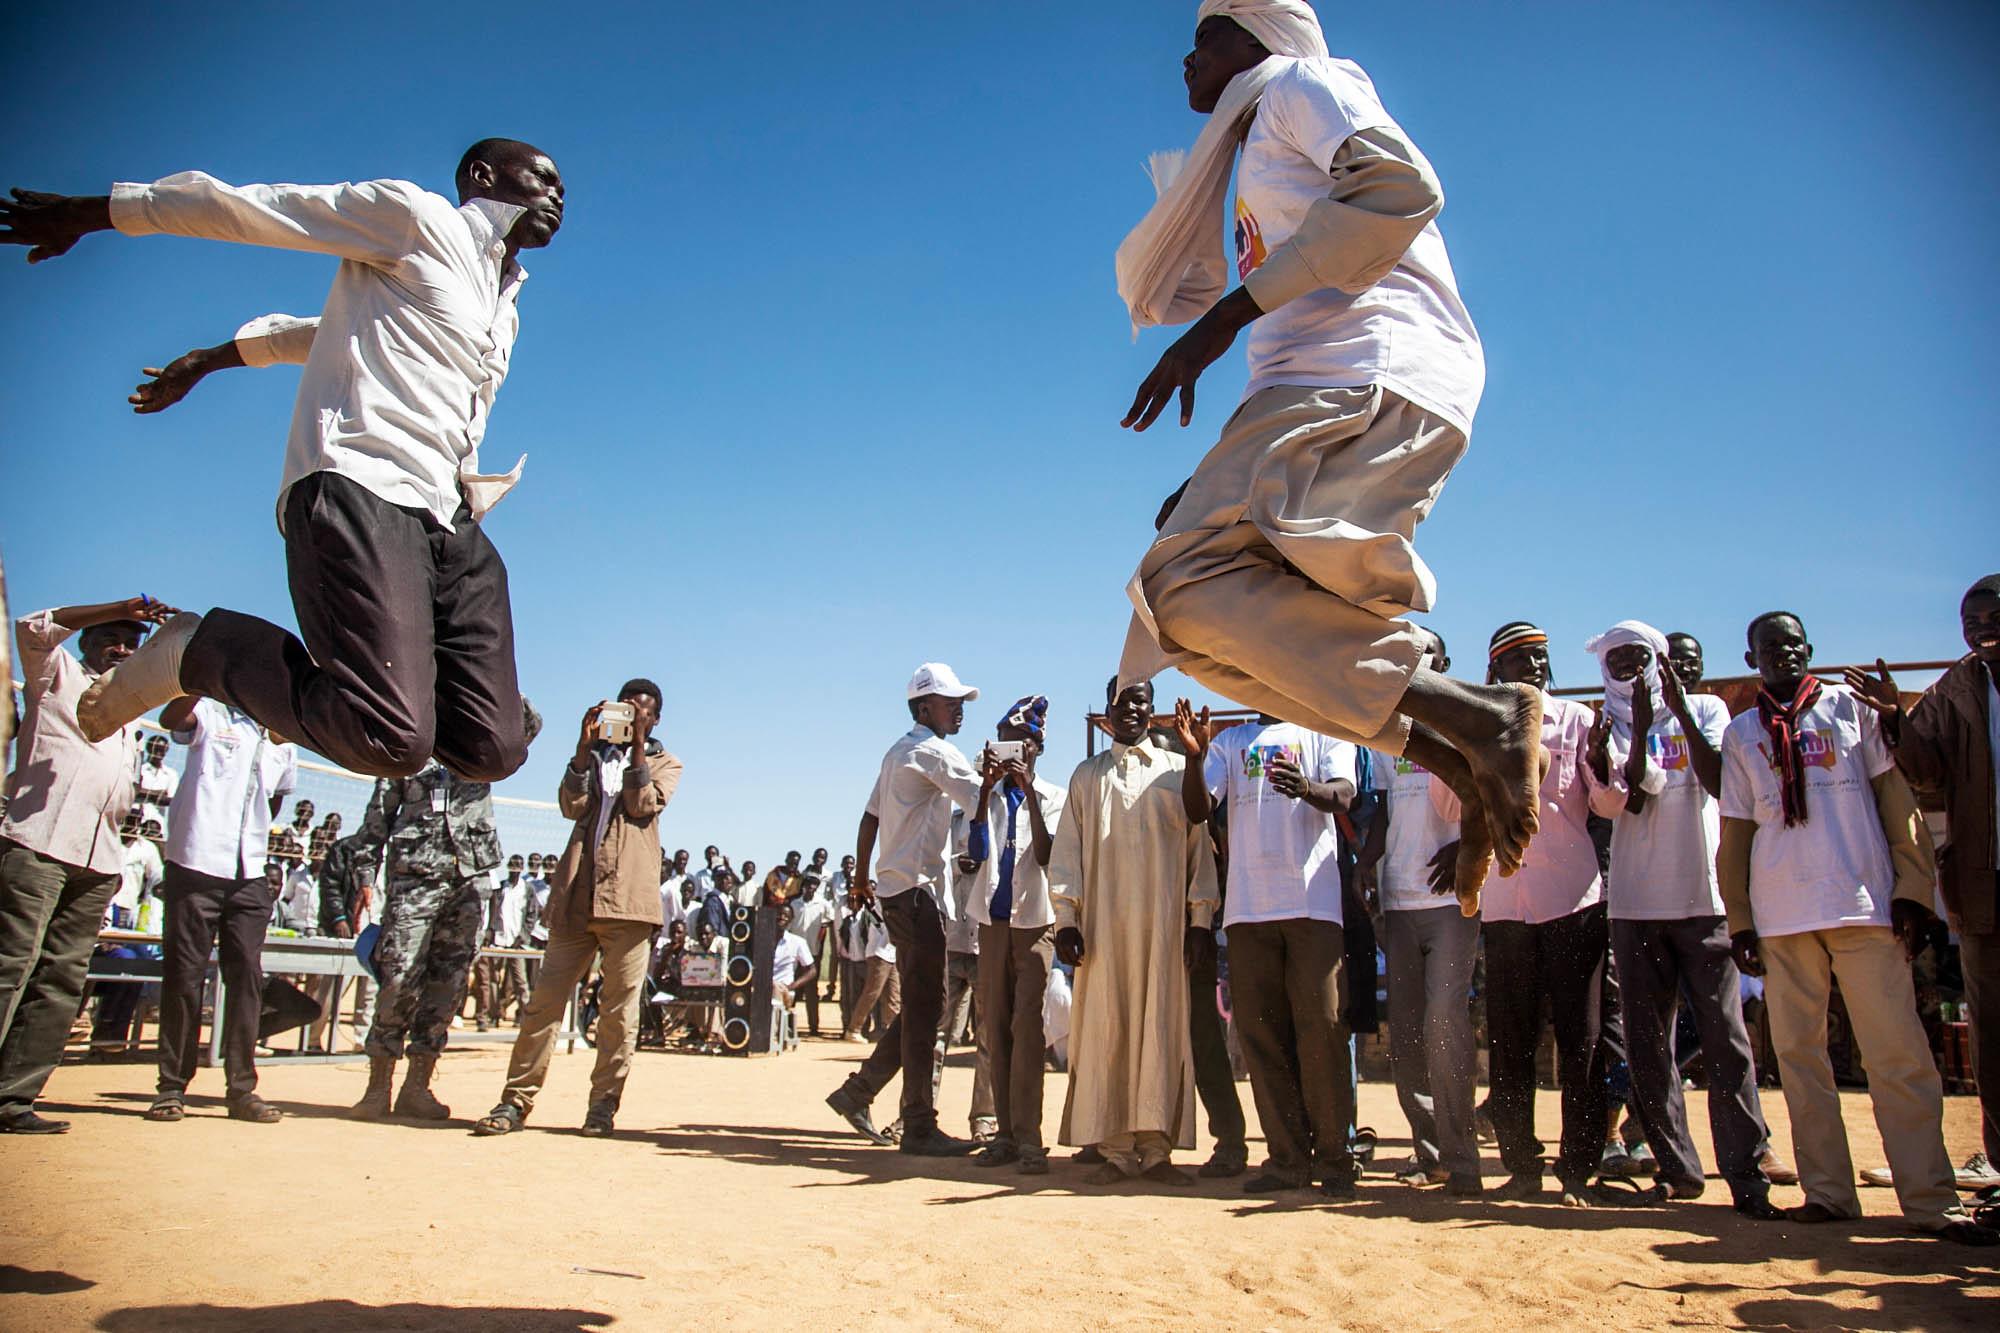 First Masalit believers surface; efforts underway to reach wider community